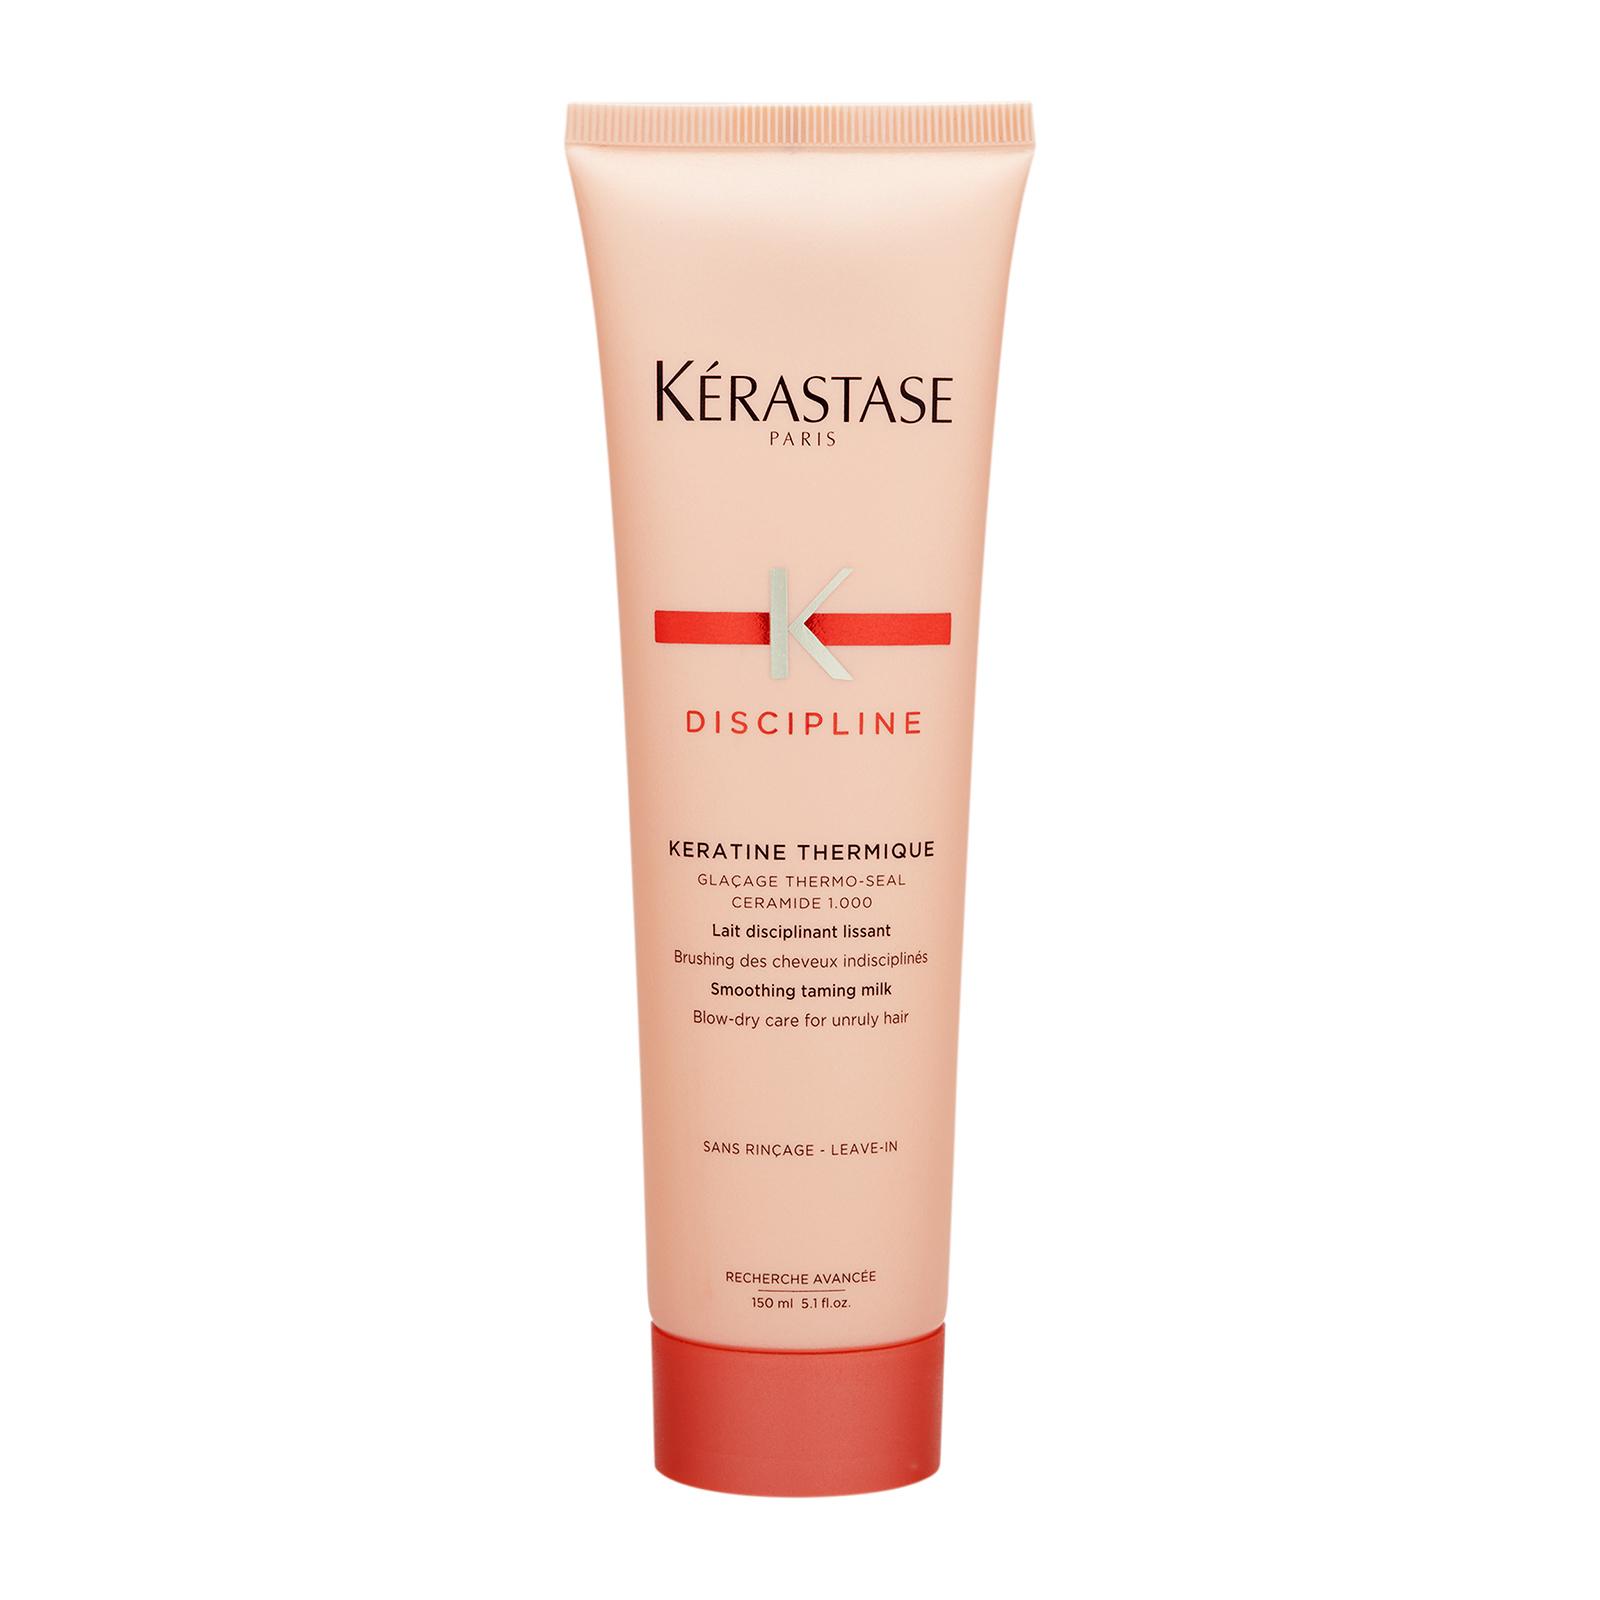 Kérastase Paris Discipline Keratine Thermique Smoothing Taming Milk (For Unruly Hair) 5.1oz, 150ml